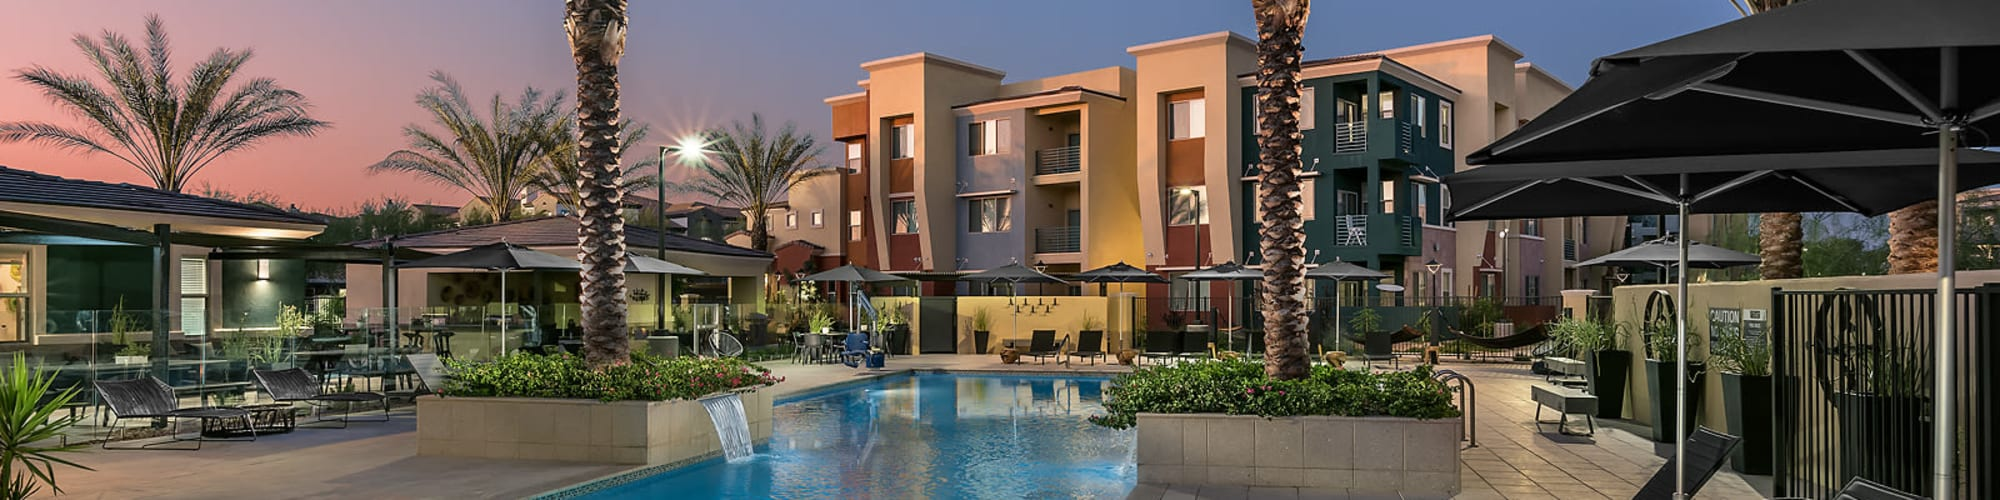 Amenities at Villa Vita Apartments in Peoria, Arizona